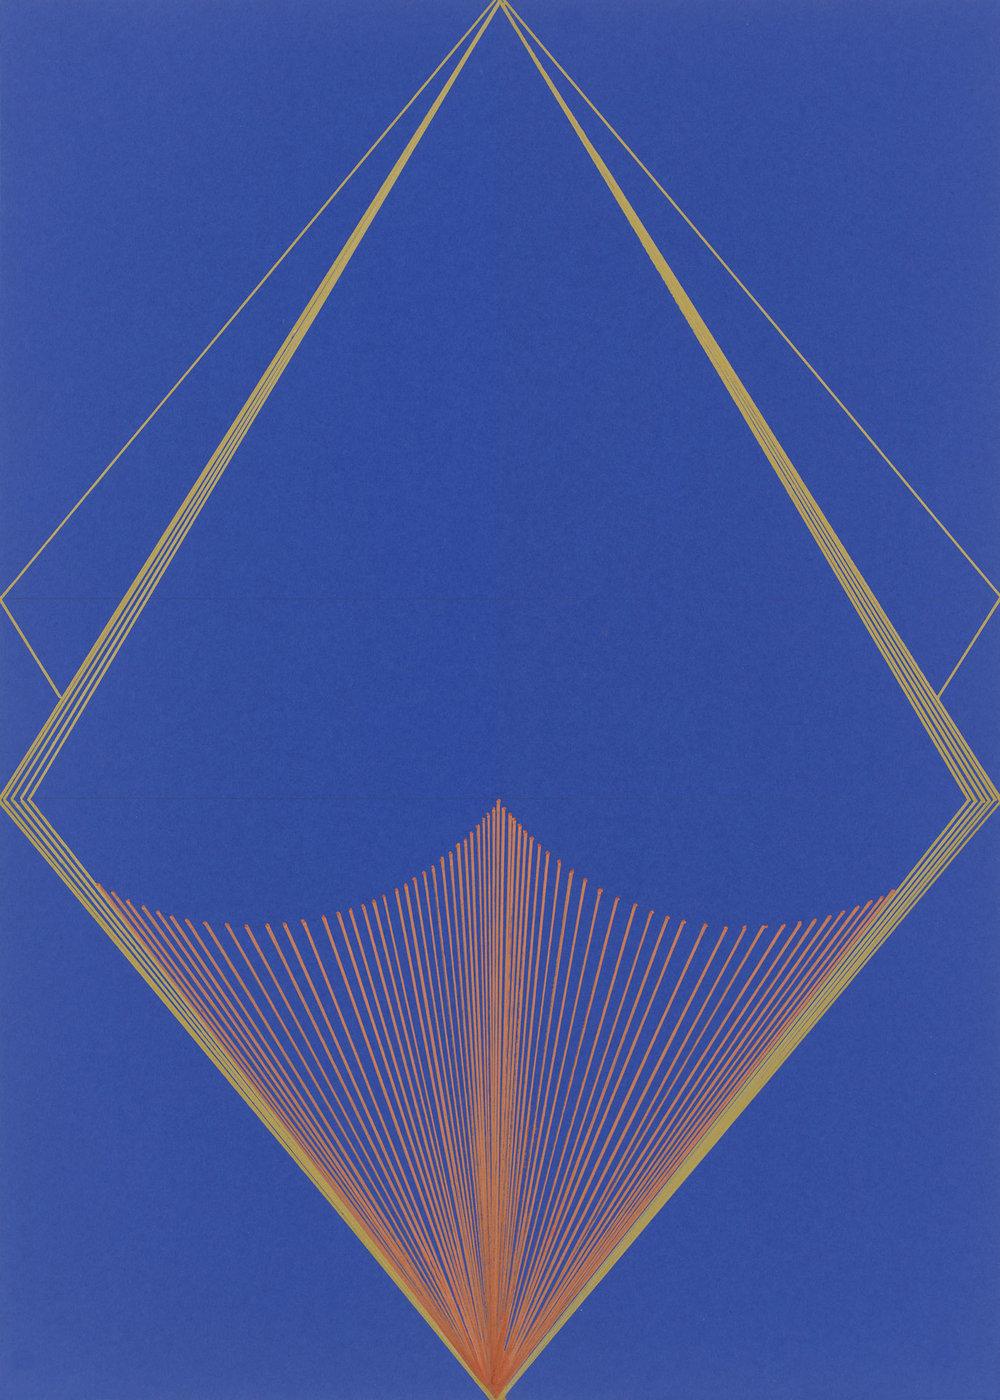 BK P44959 | UNTITLED | ACRYLIC METALLIC ON BLUE CARD BOARD | 70 X 50 | 2019.jpg